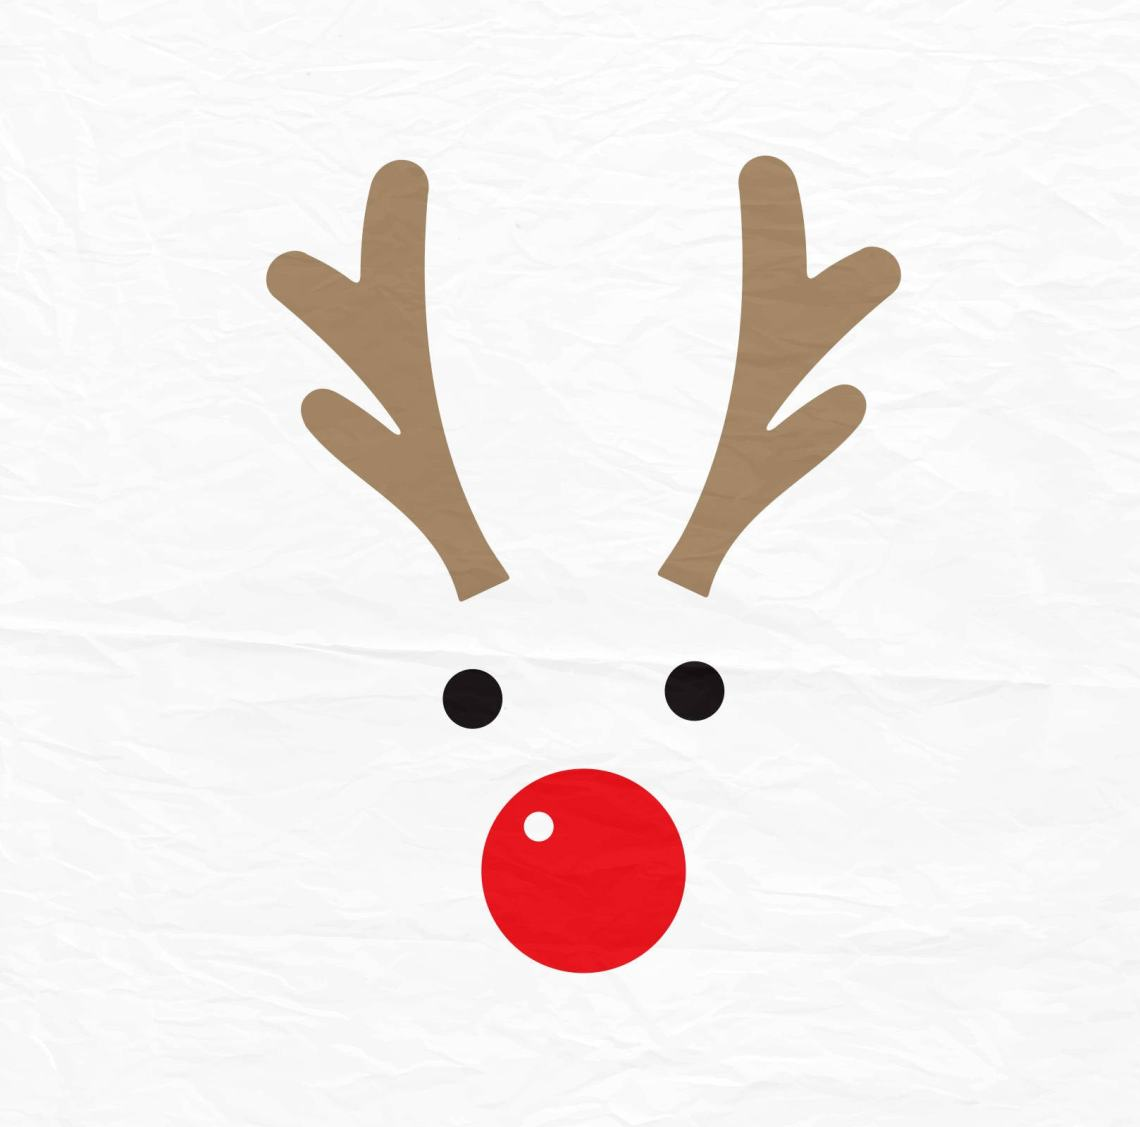 Download Rudolph Christmas Reindeer SVG Reindeer Face SVG Reindeer